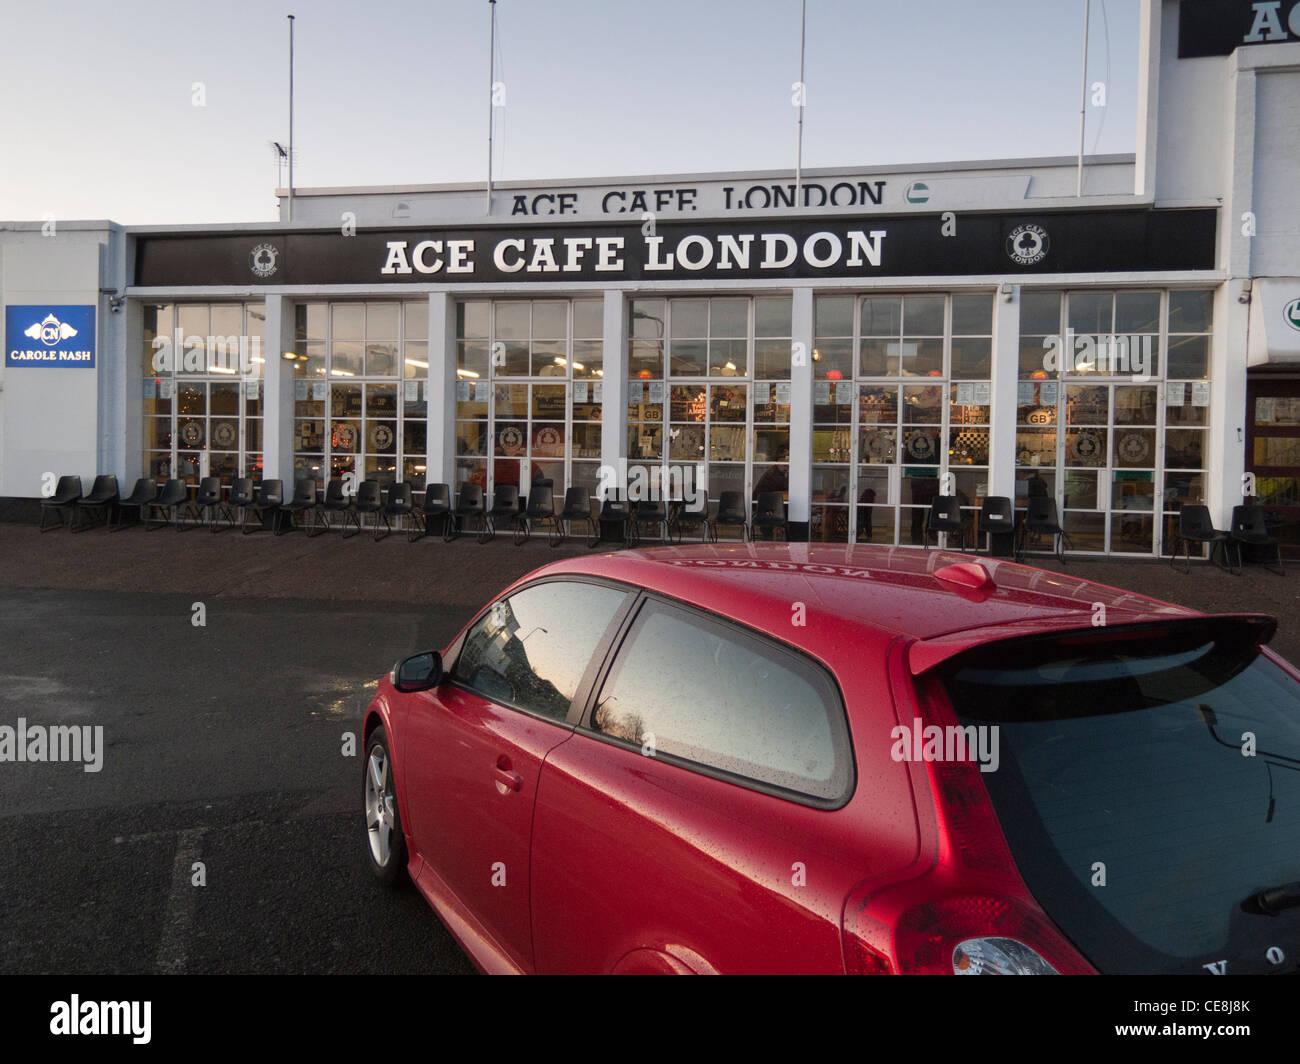 Ace Café,London,England - Stock Image